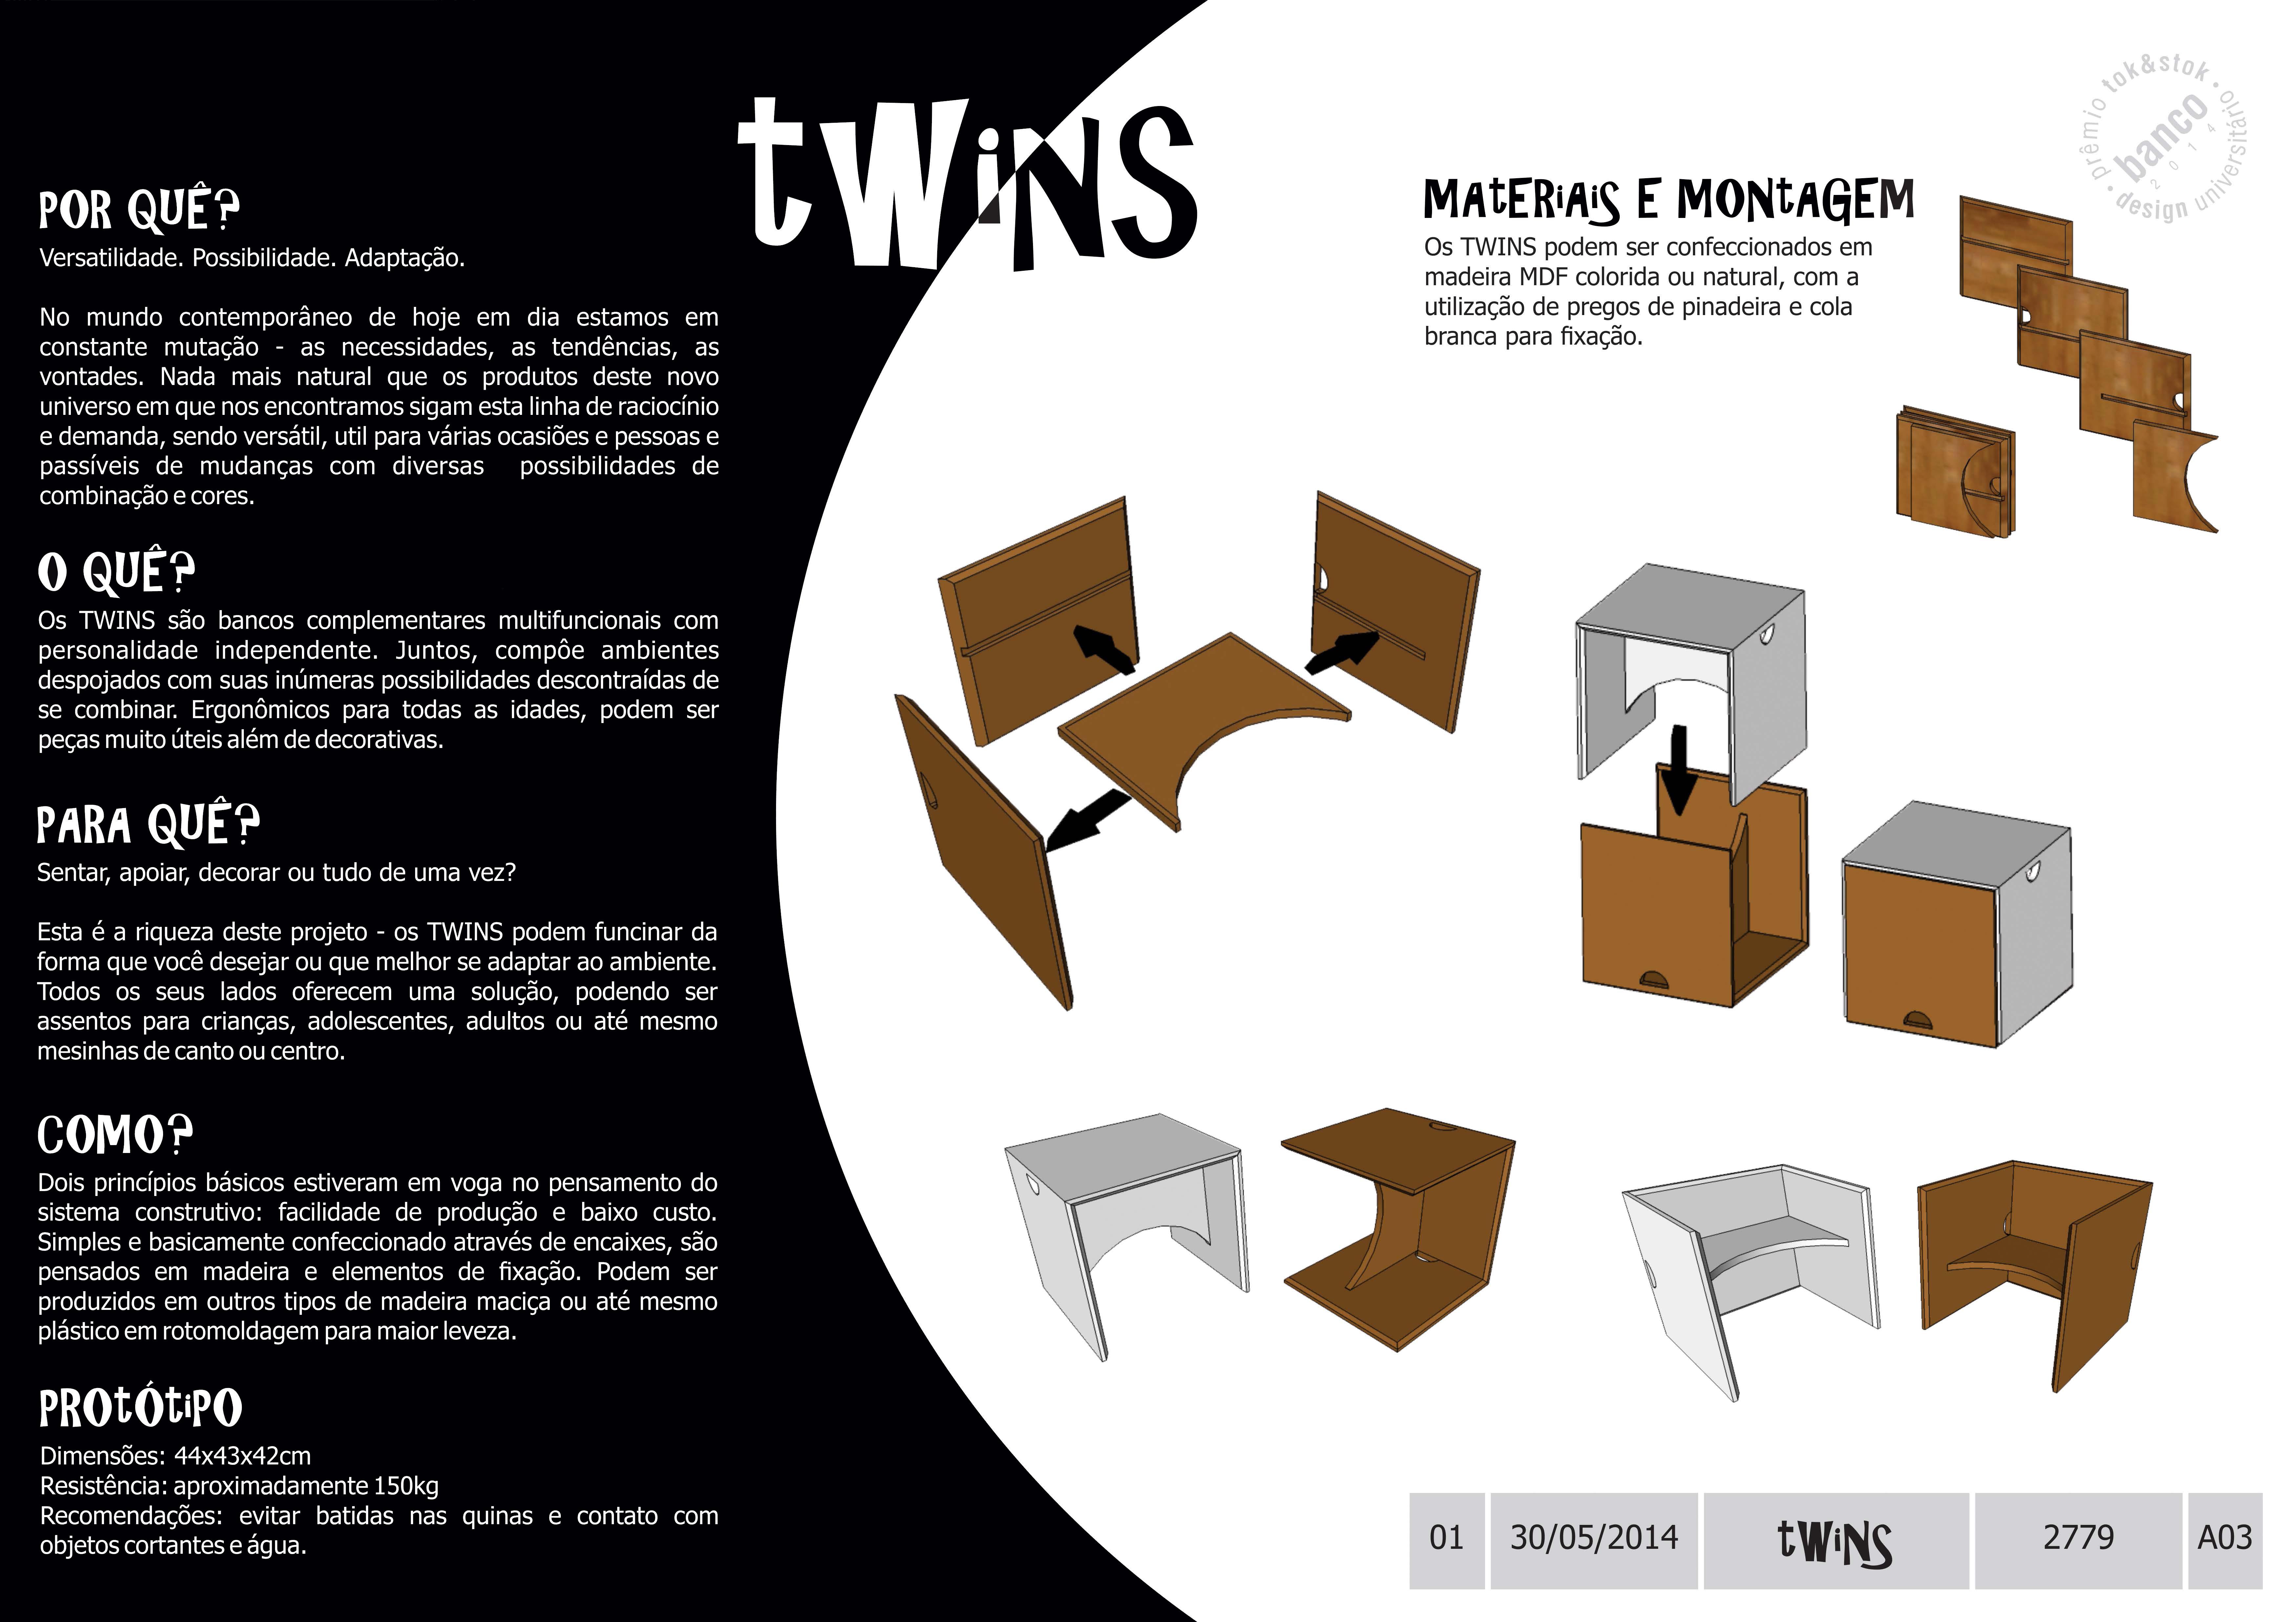 Prancha_01 | Twins